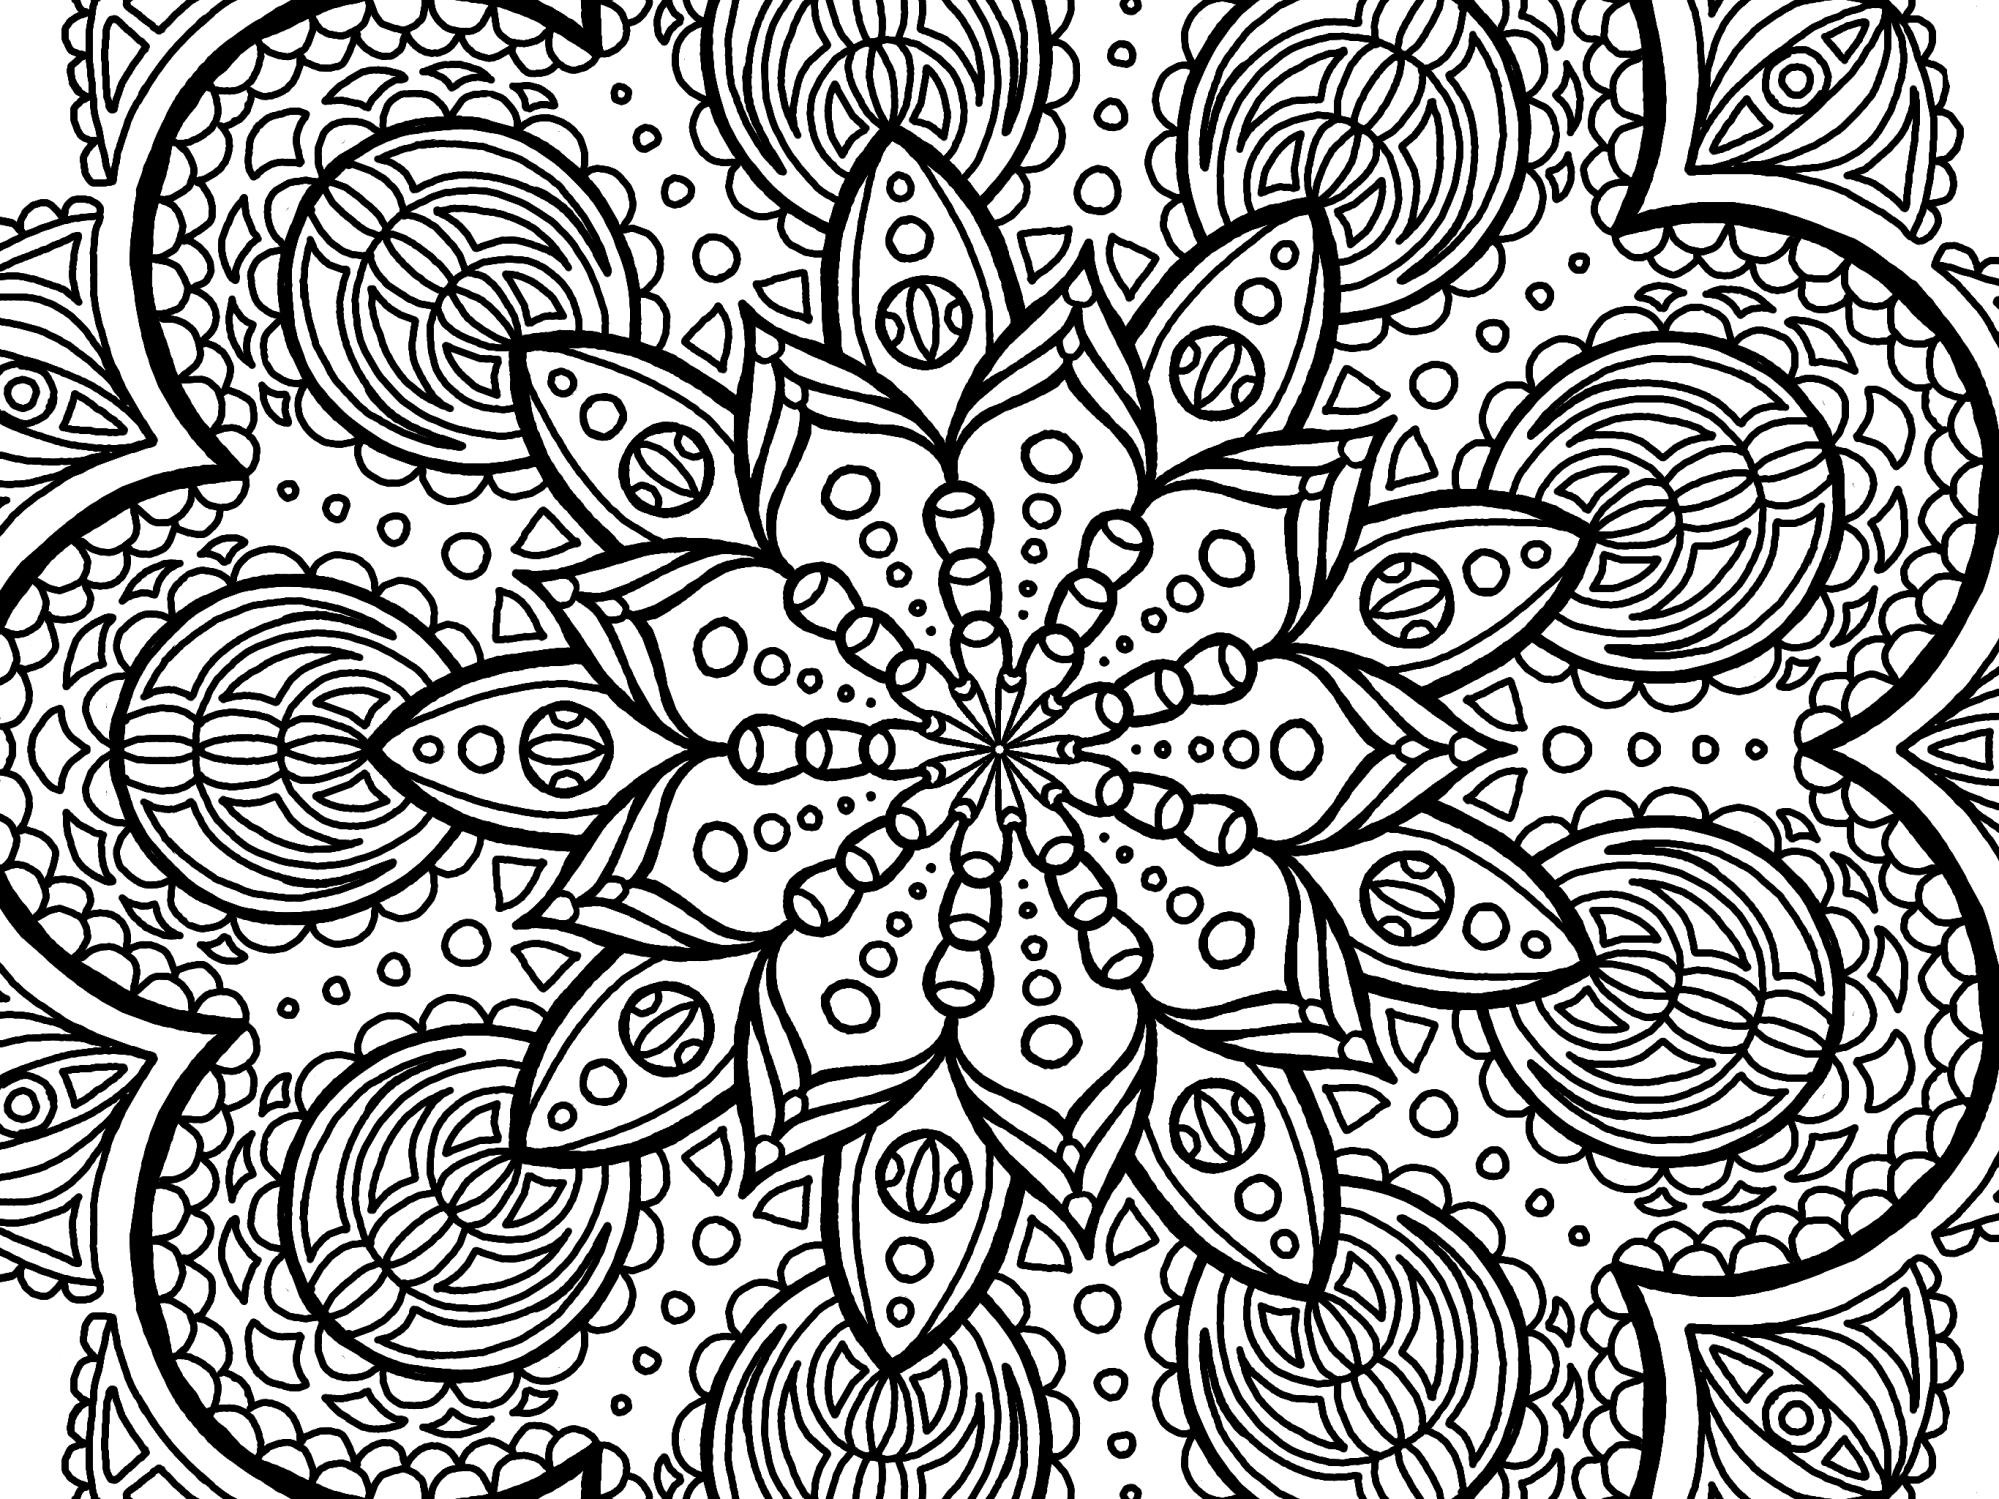 Cool Mandala Drawing 8